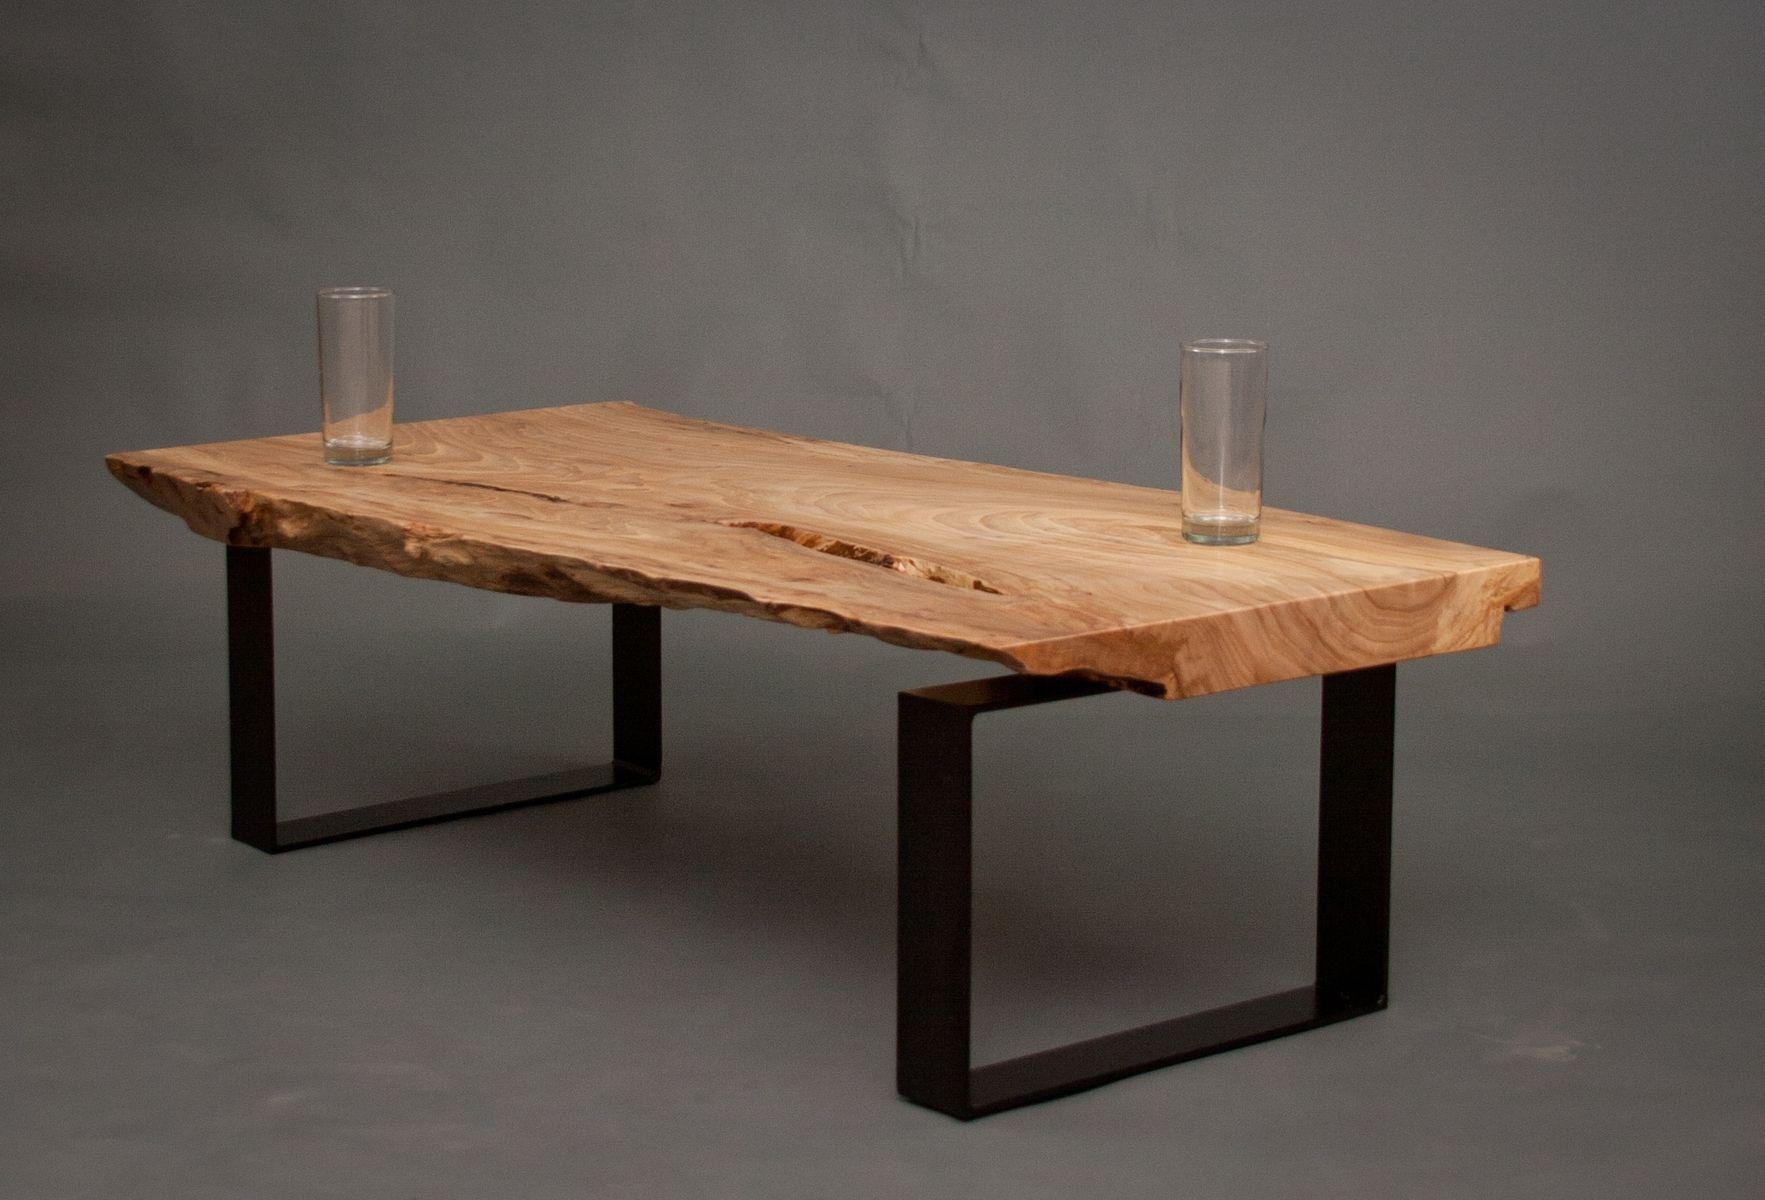 natural wood for furniture making